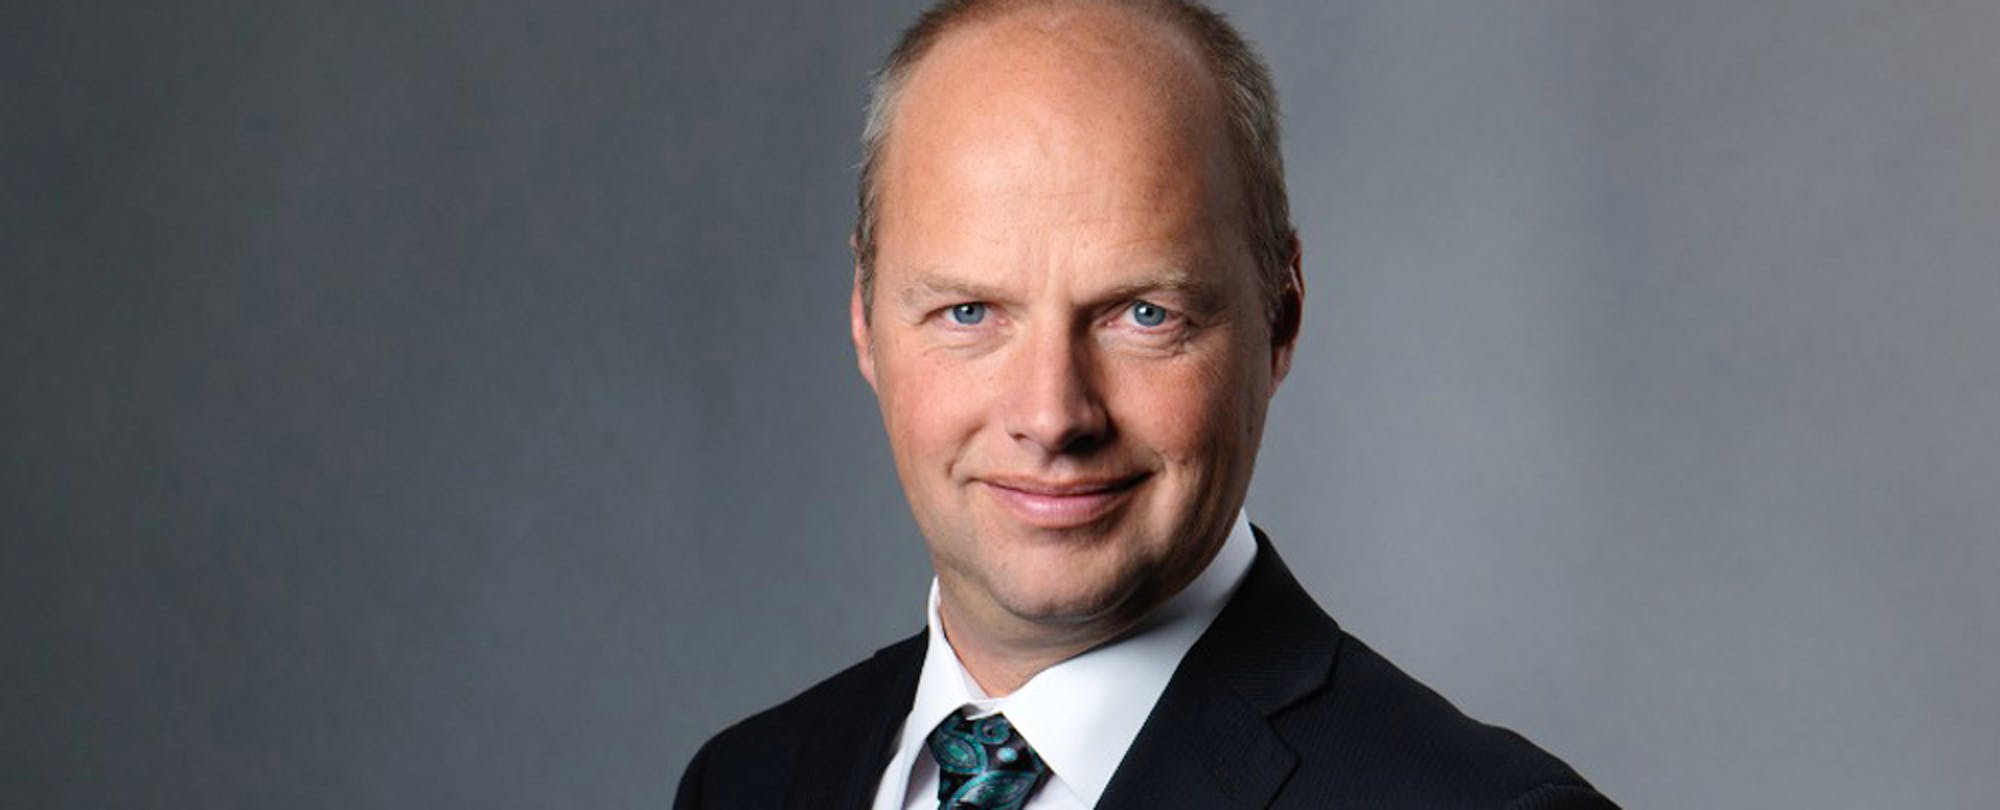 What Sebastian Thrun Has Learned at Udacity